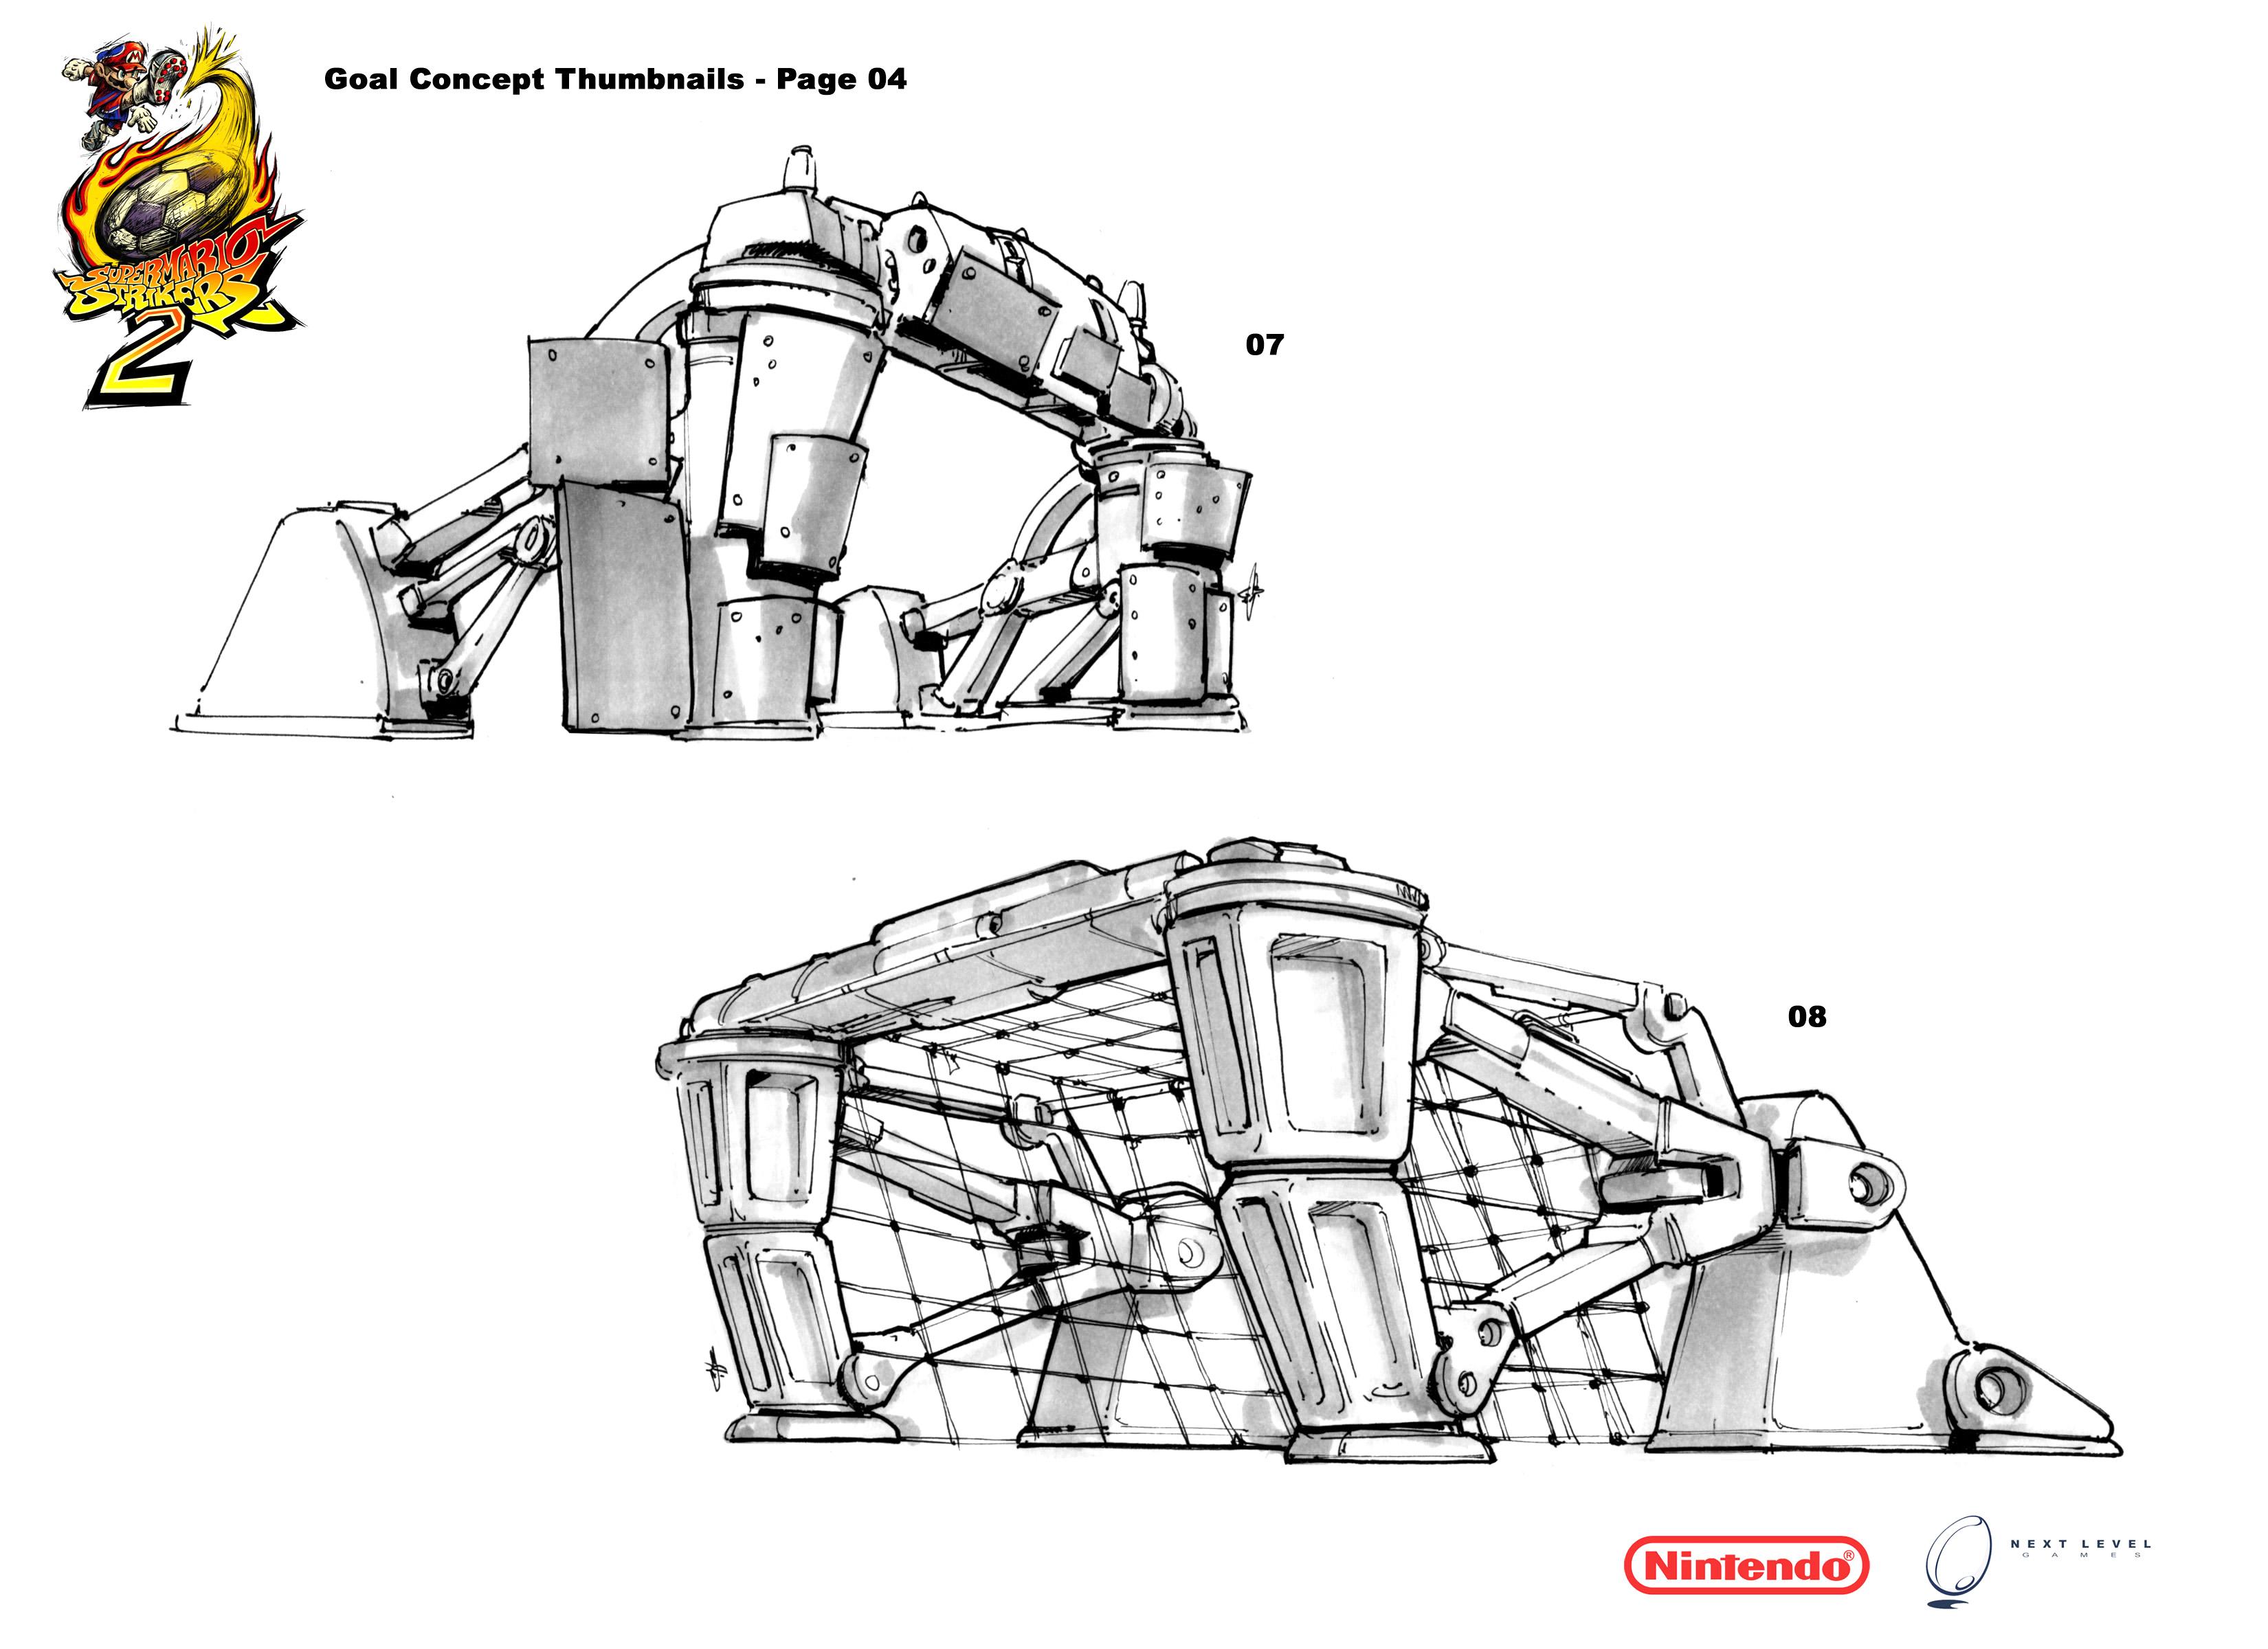 Super Mario Strikers 2 Beta Concept